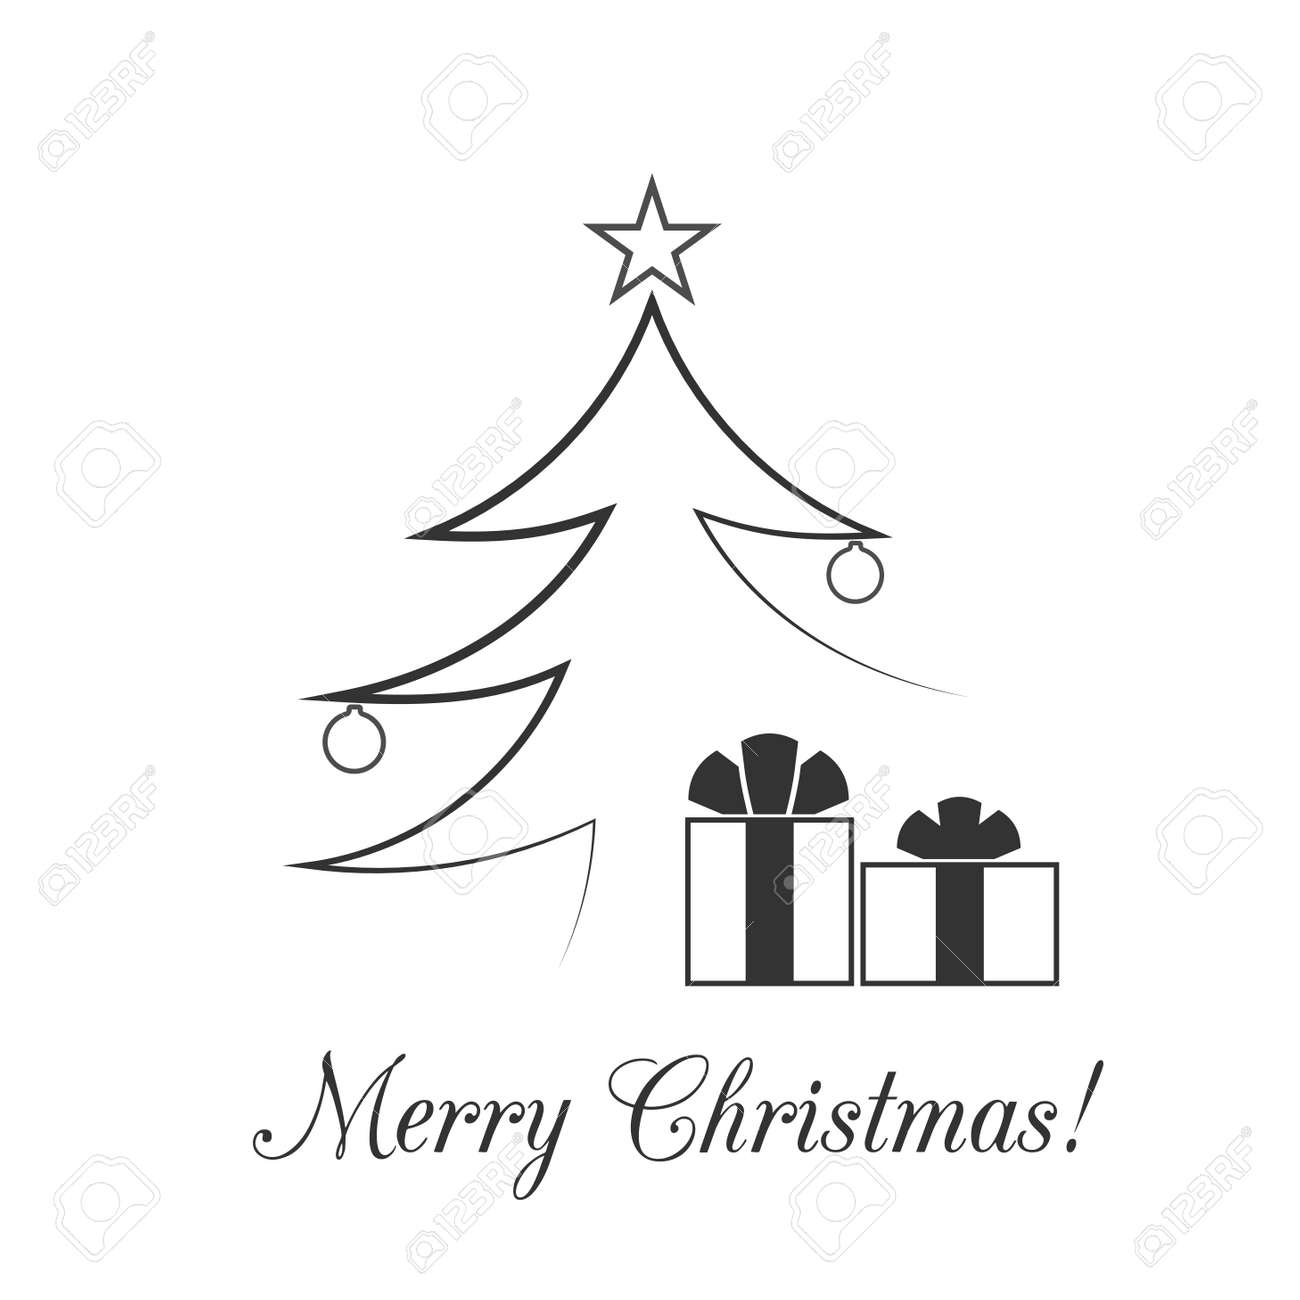 Christmas Tree Card Balls Star Gift Cartoon Icon Black Silhouette